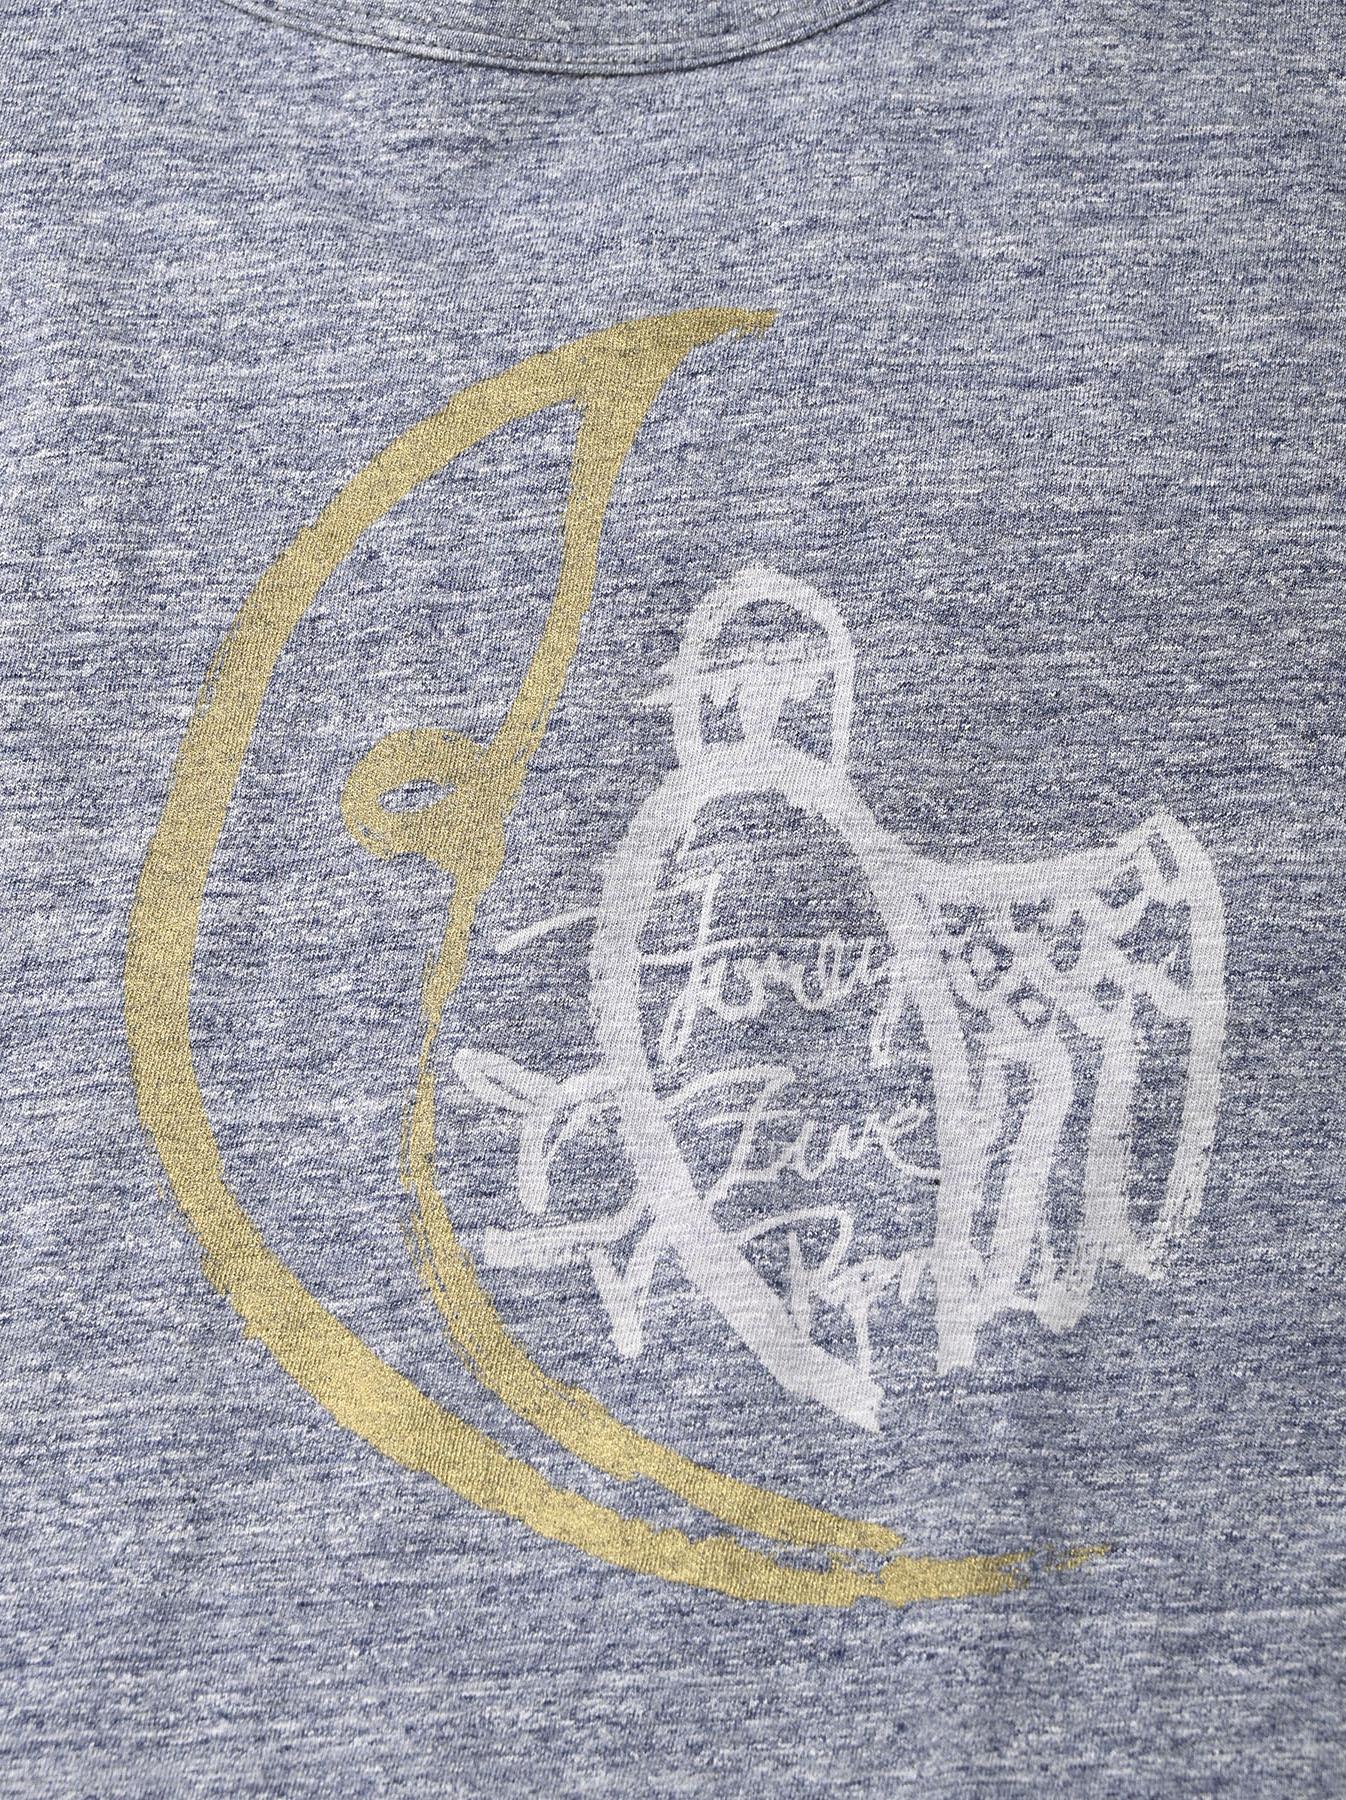 Top Sumite de Owl T-shirt-6